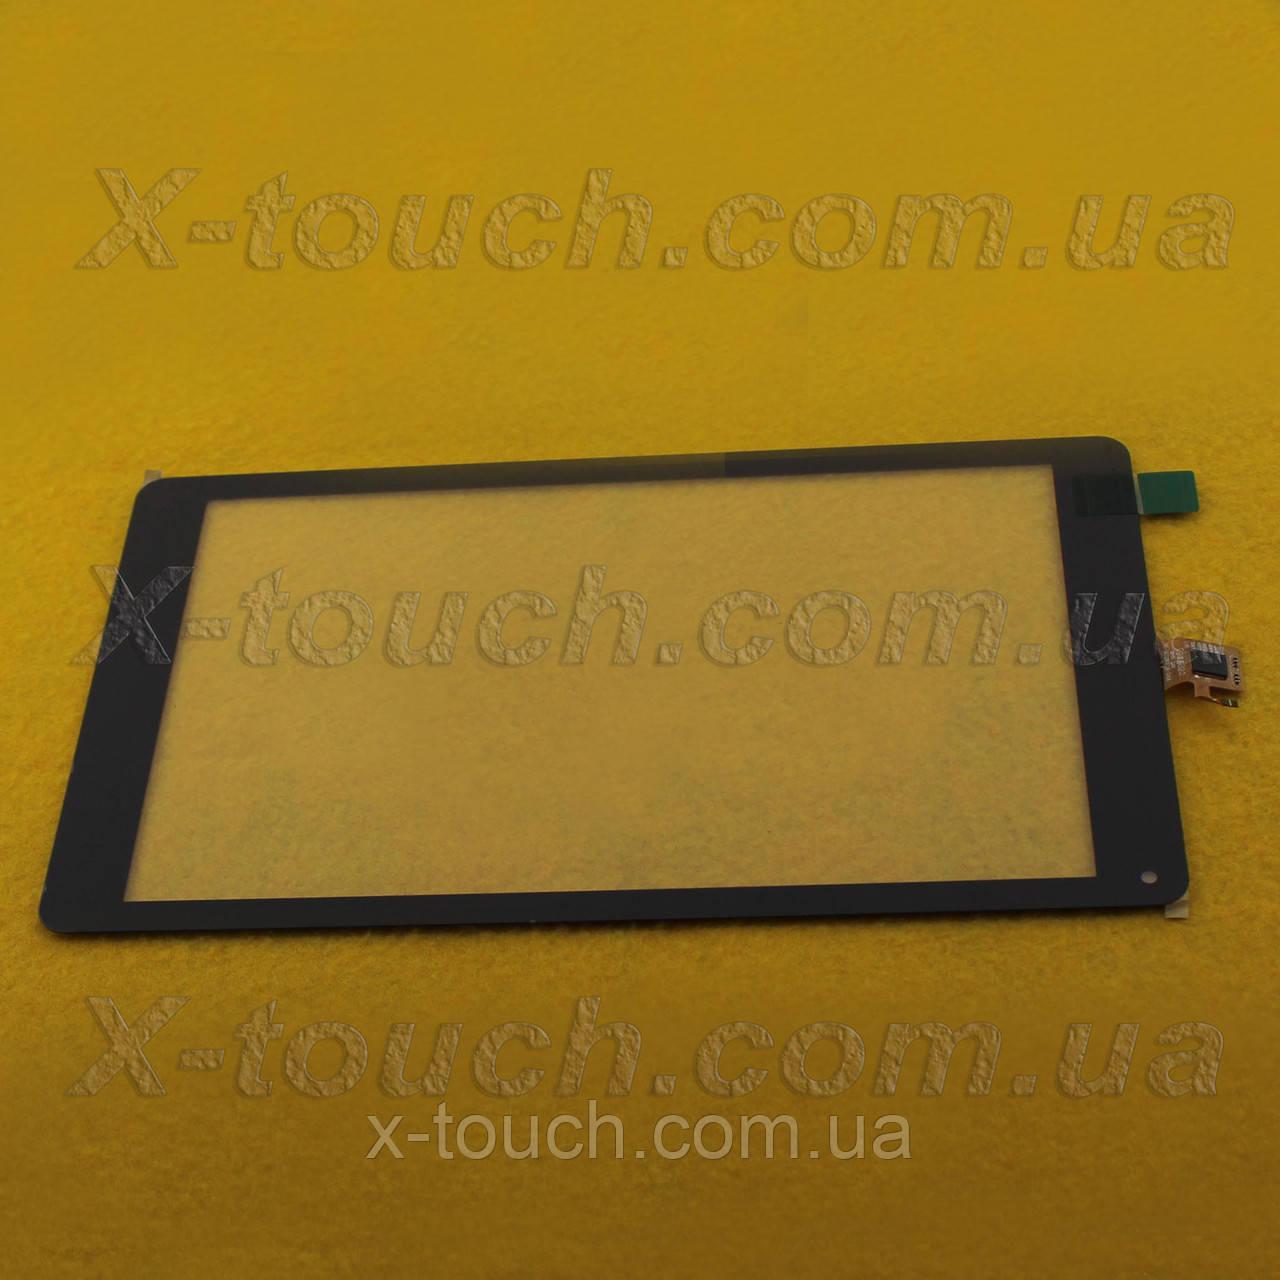 Тачскрін, сенсор DXP1-0623-101A для планшета